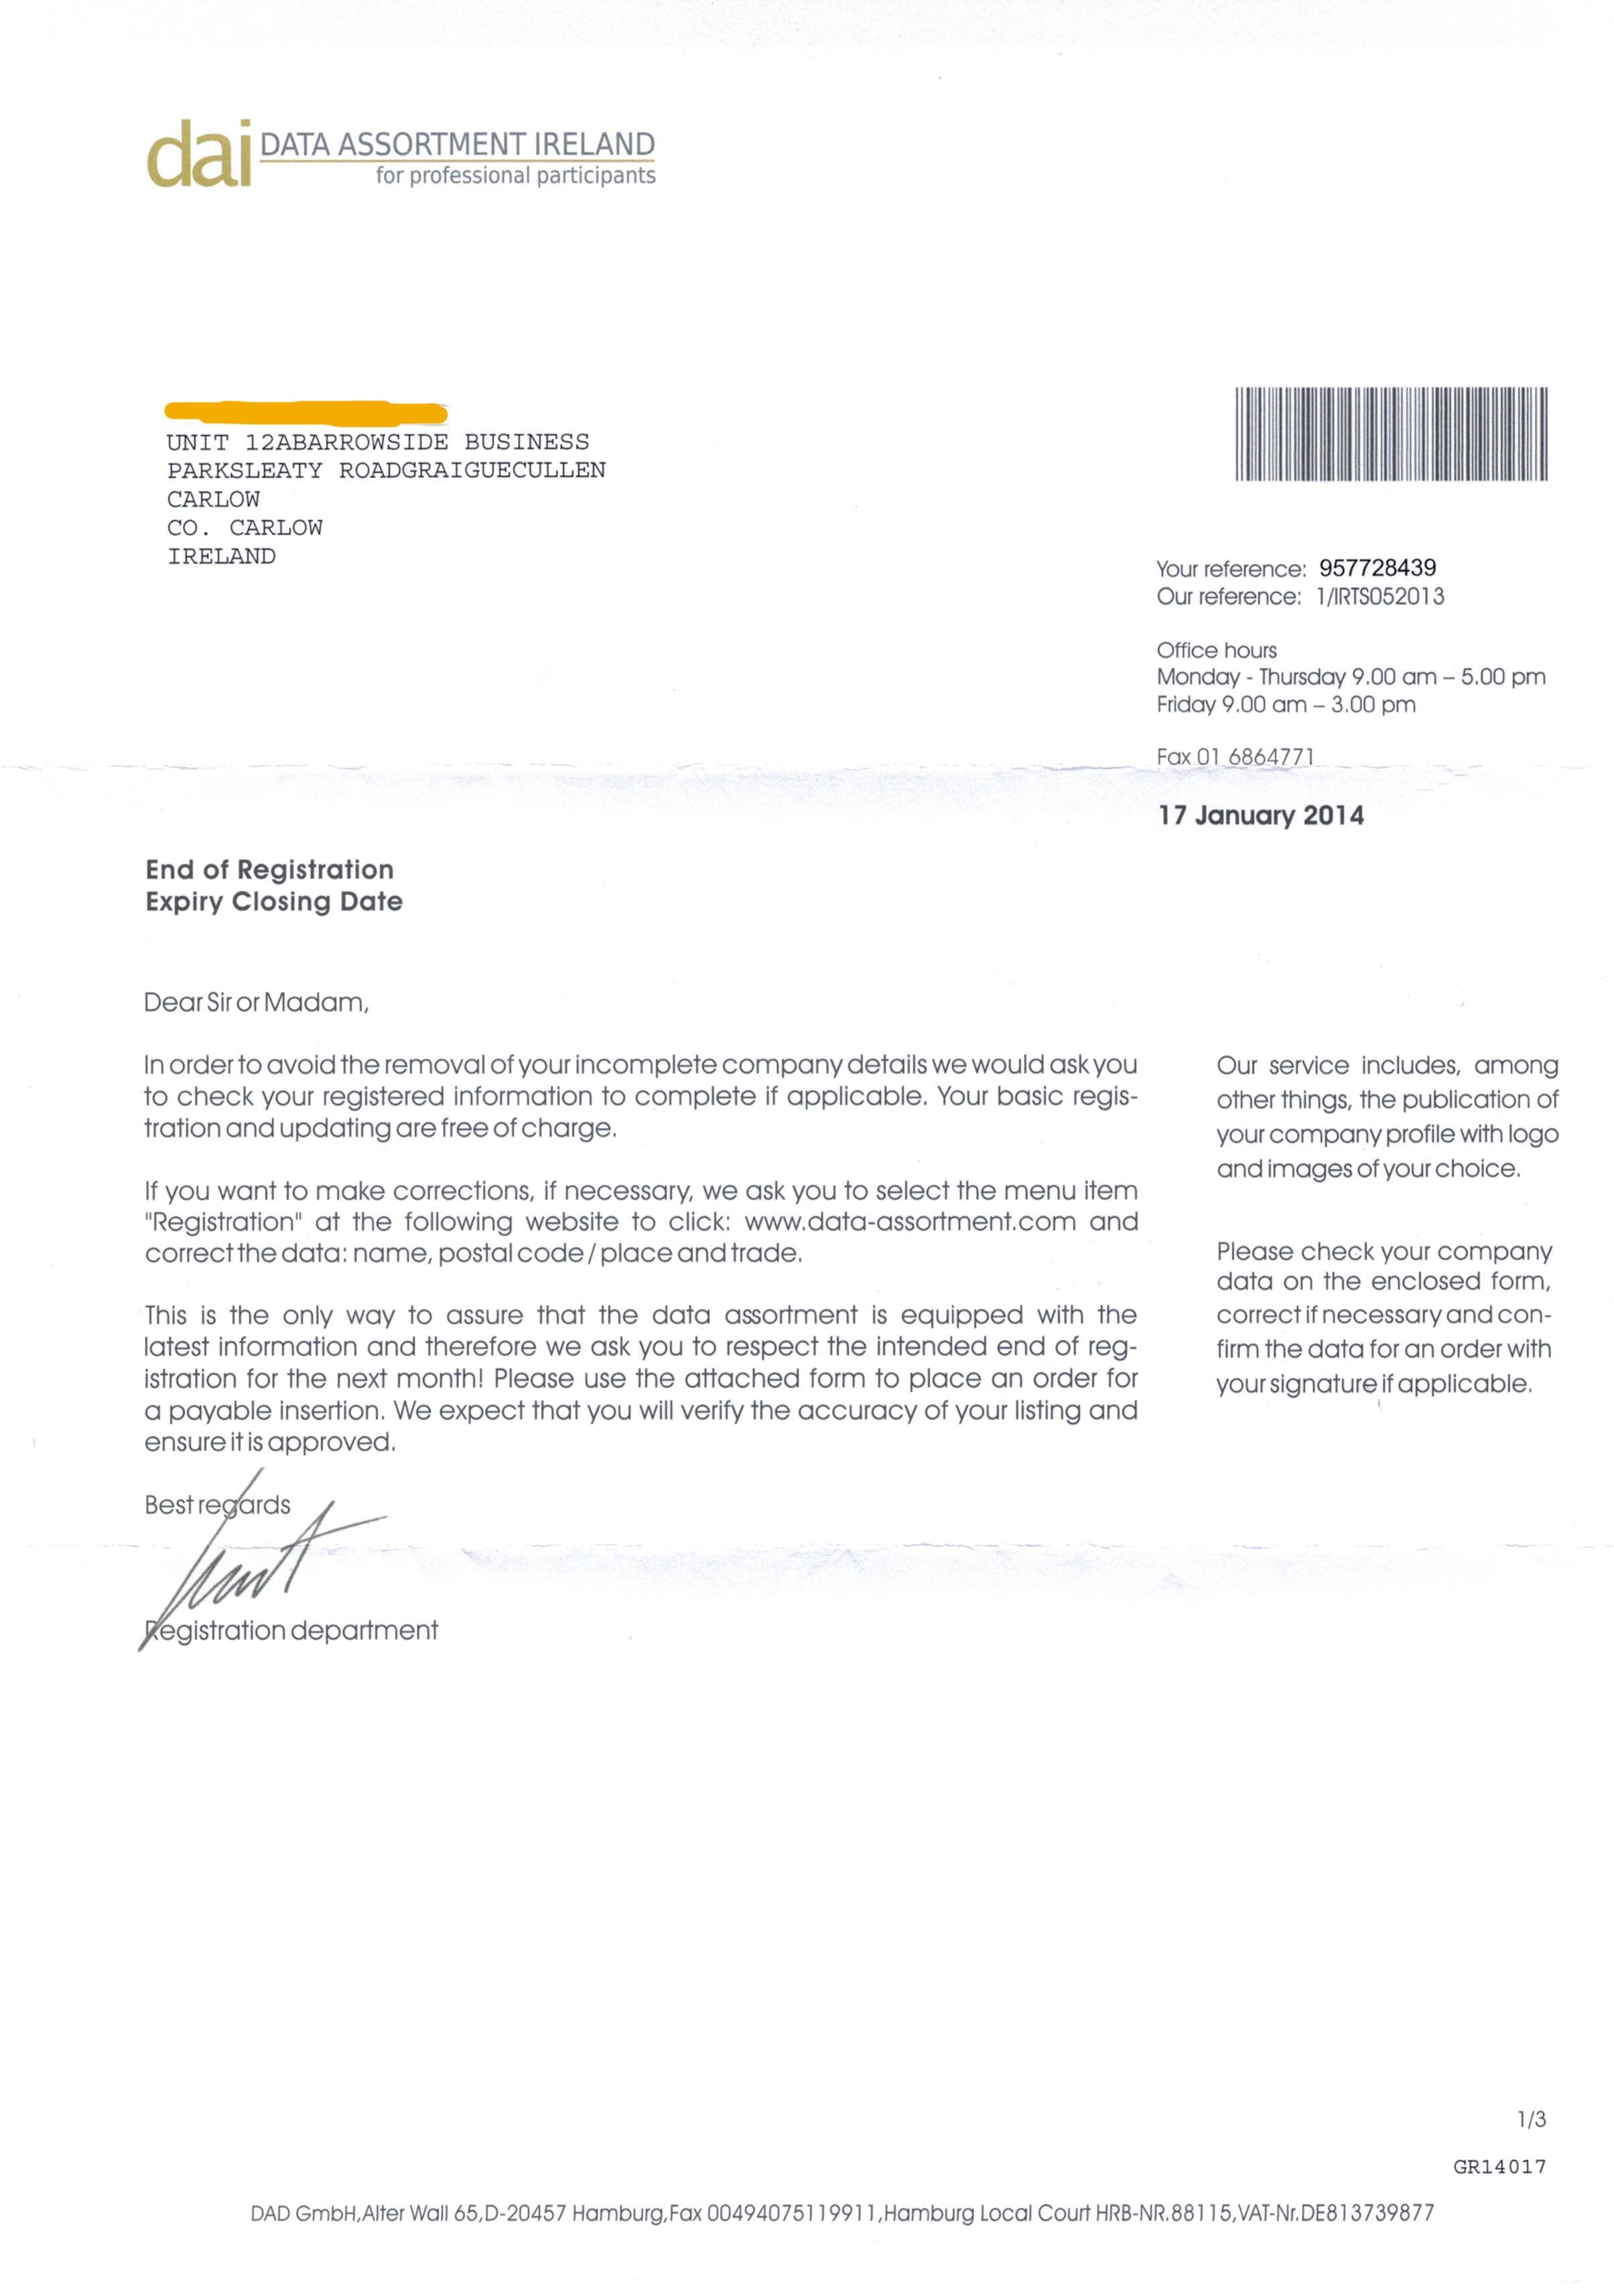 Data assortment Ireland letter